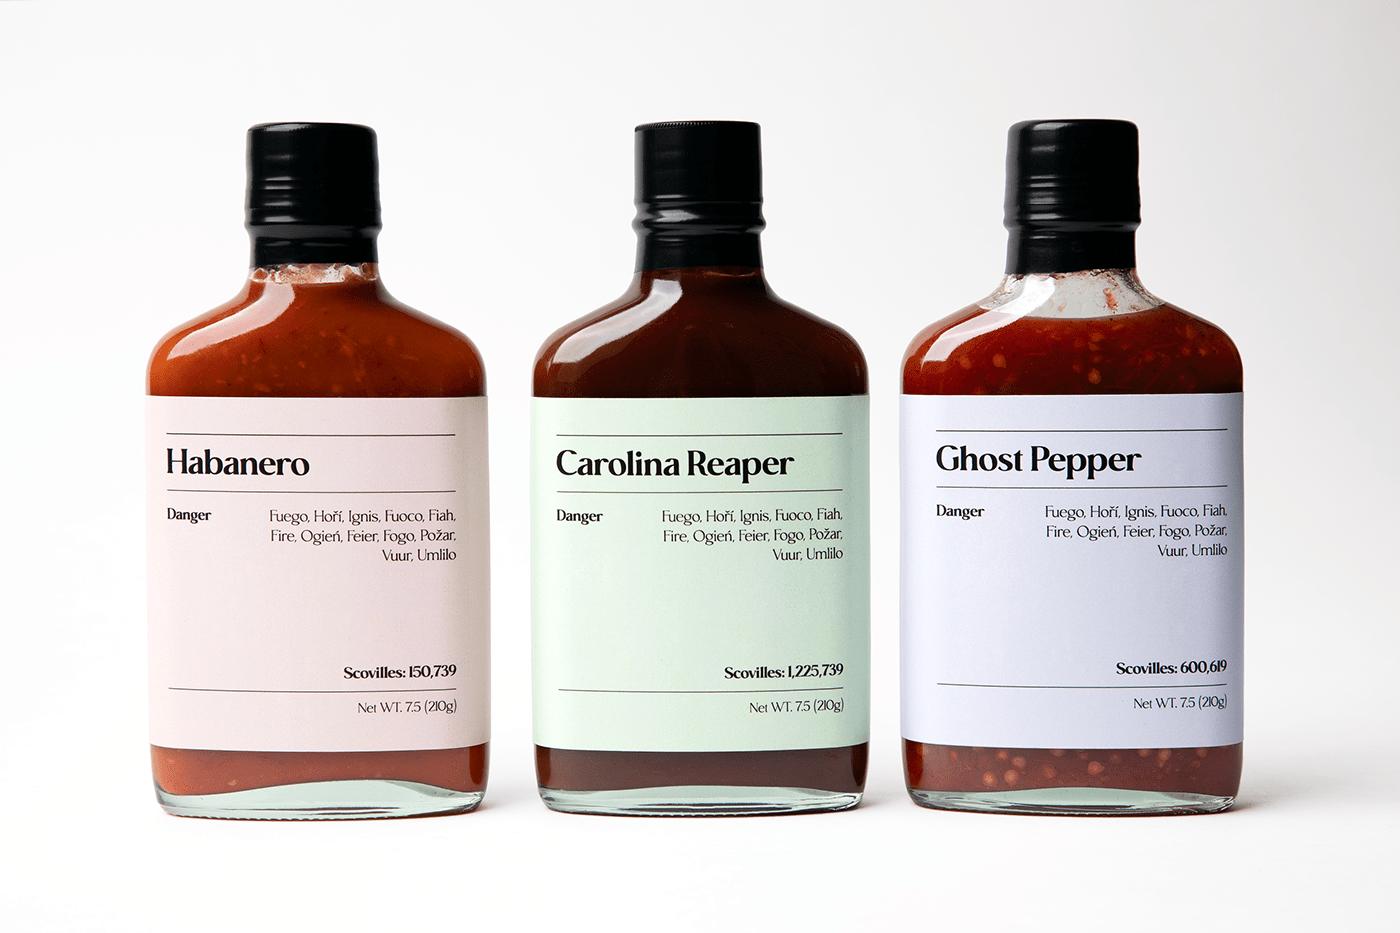 Habanero, carolina reaper and ghost pepper bottles.